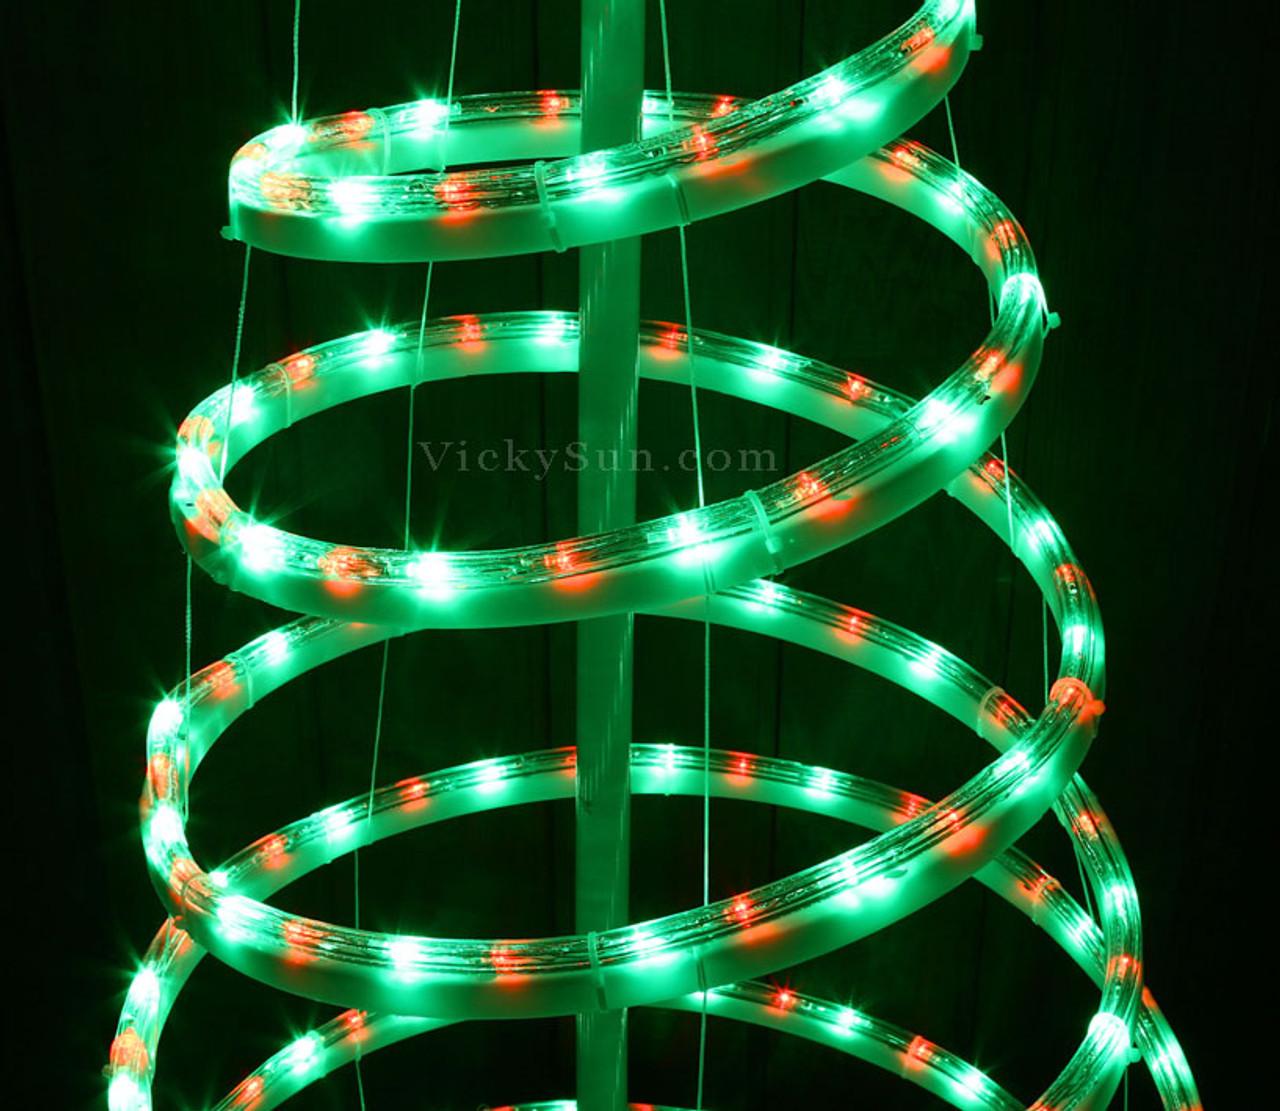 VickySun.com - Animated 153CM LED Red and Green Spiral Christmas Tree and Star Lights (36V Safe ...